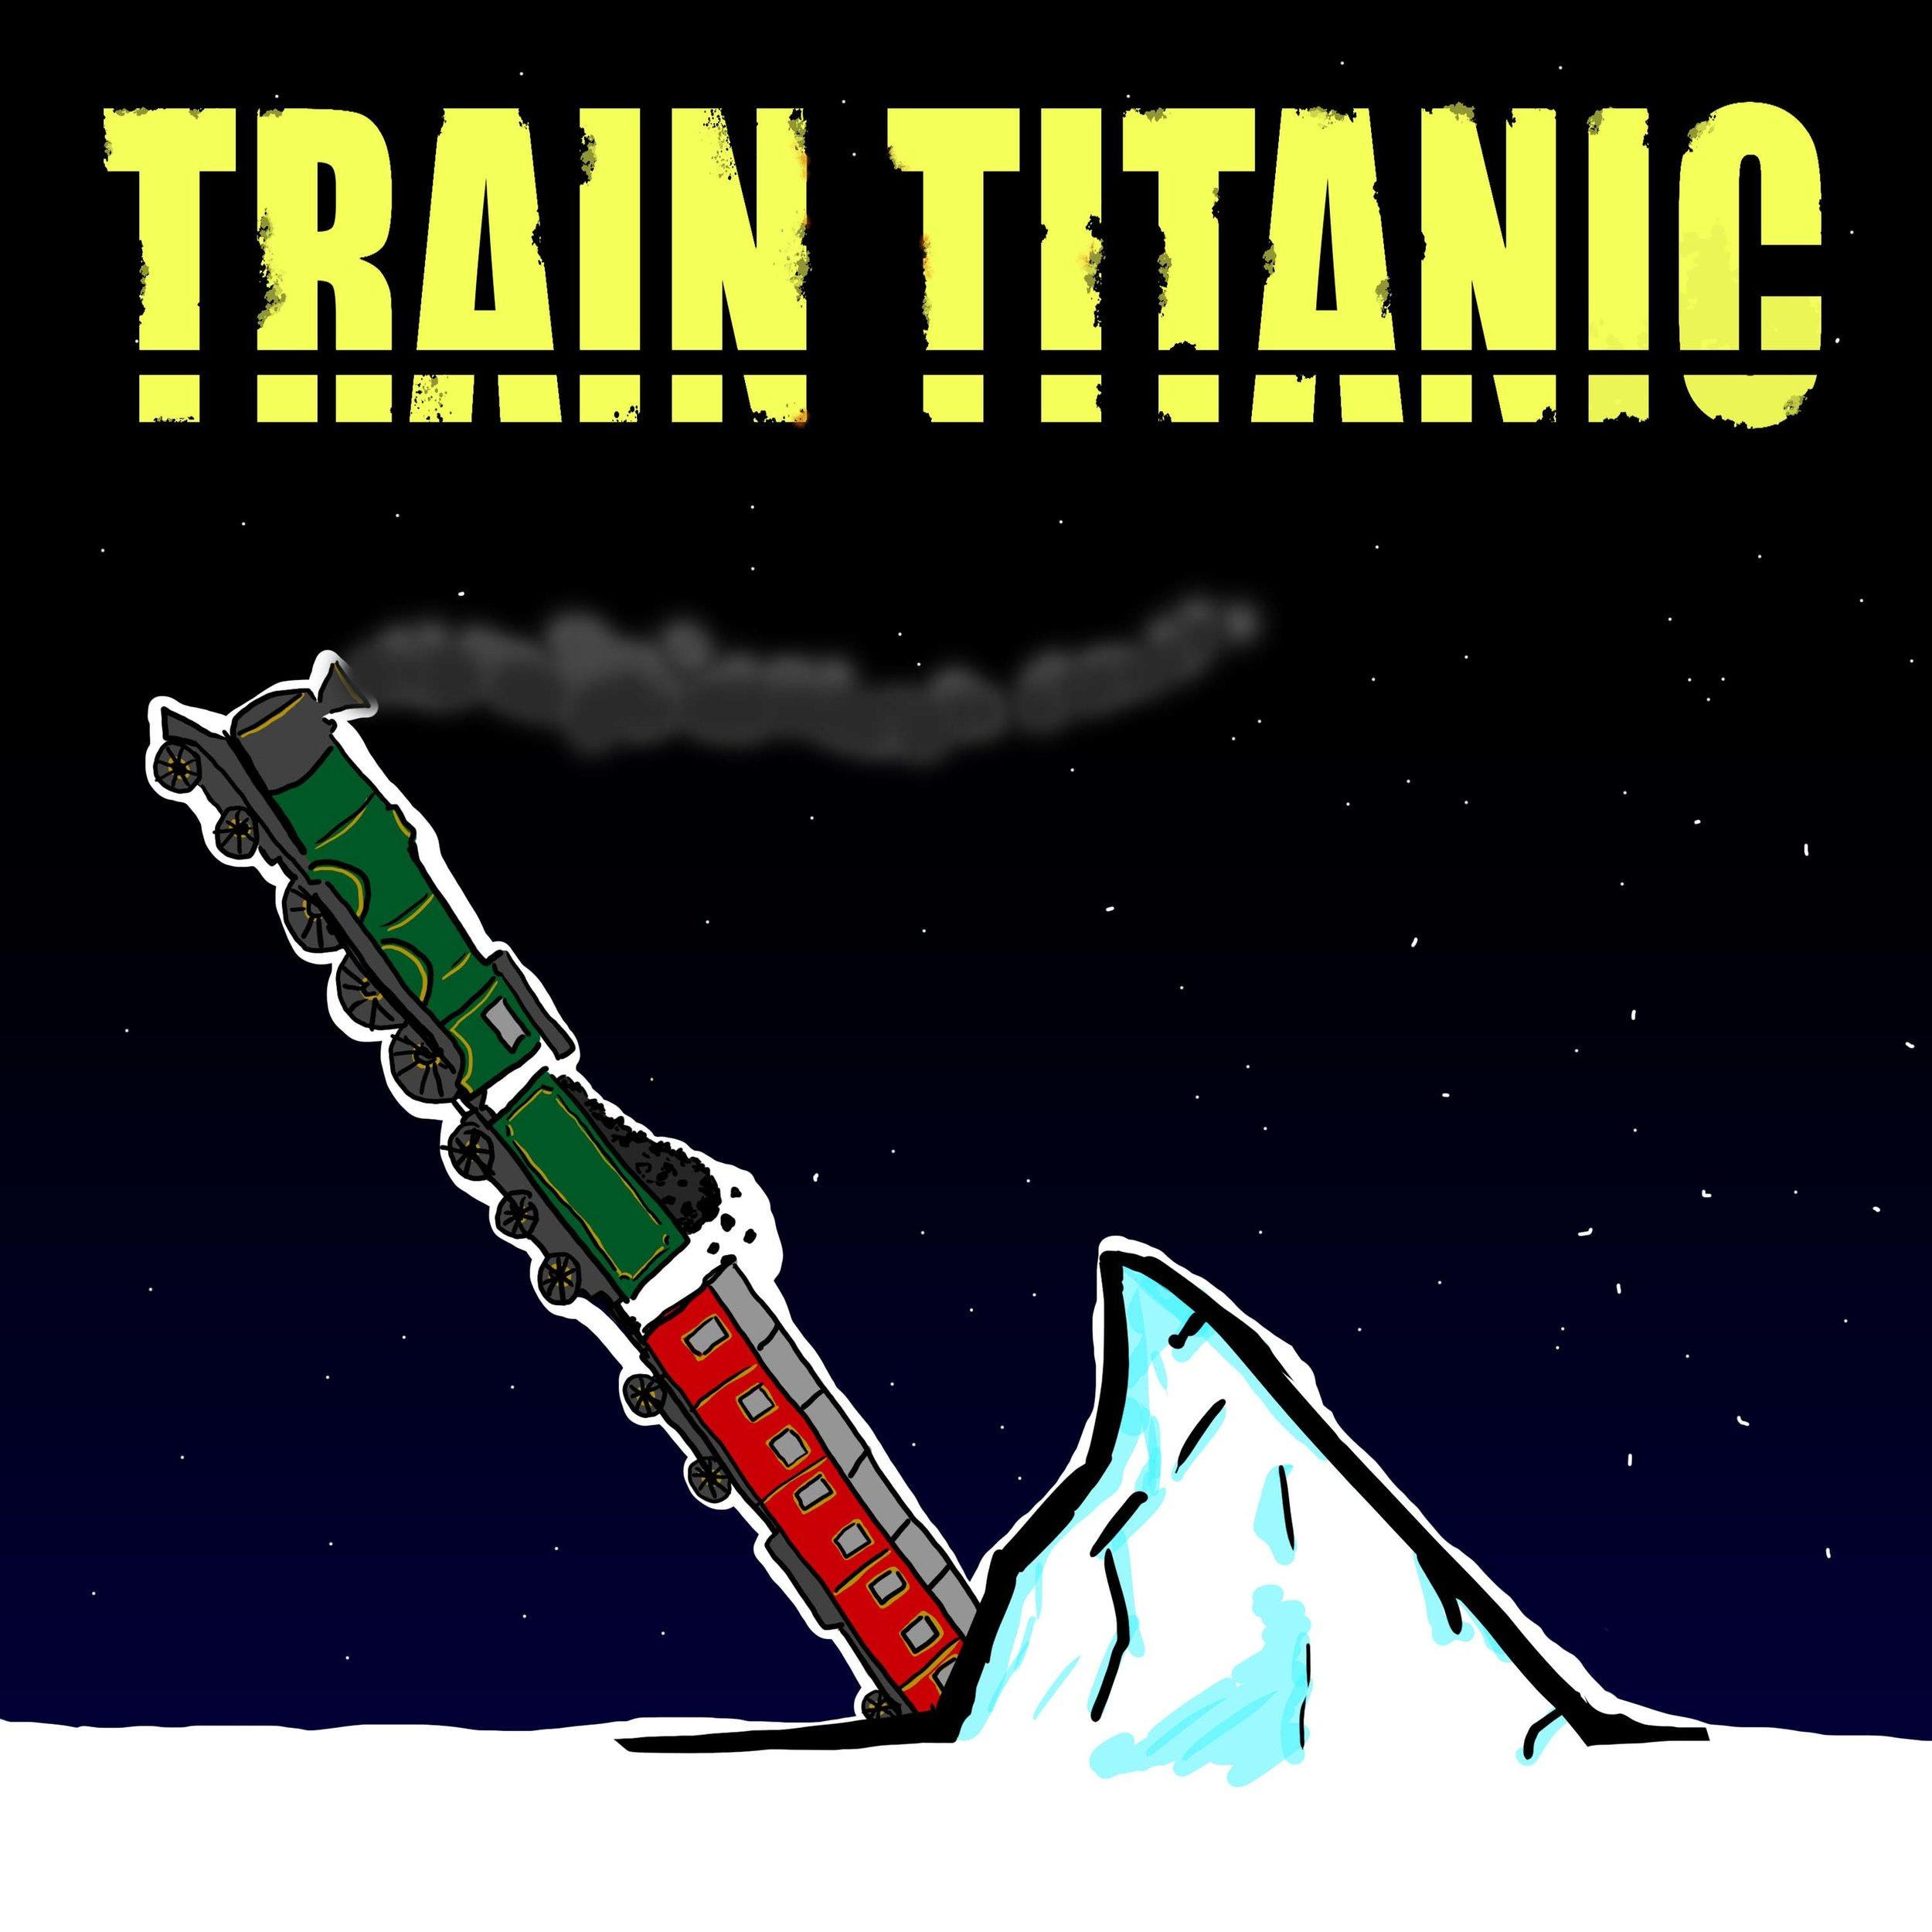 Train Titanic.jpg